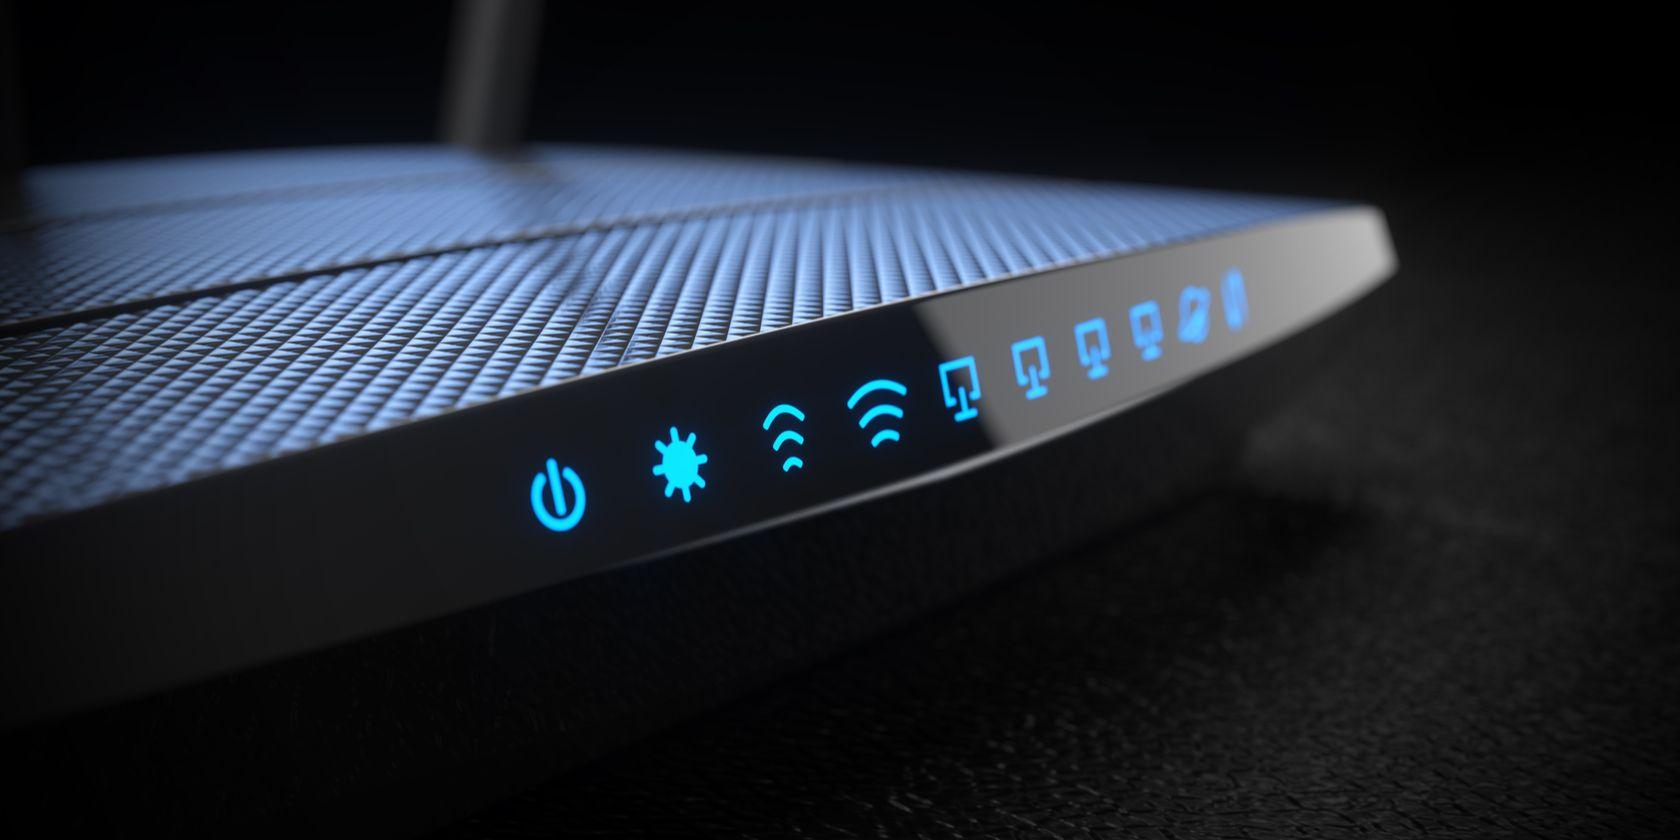 8 Ways to Fix a Disconnecting Wi-Fi Problem on Windows 10